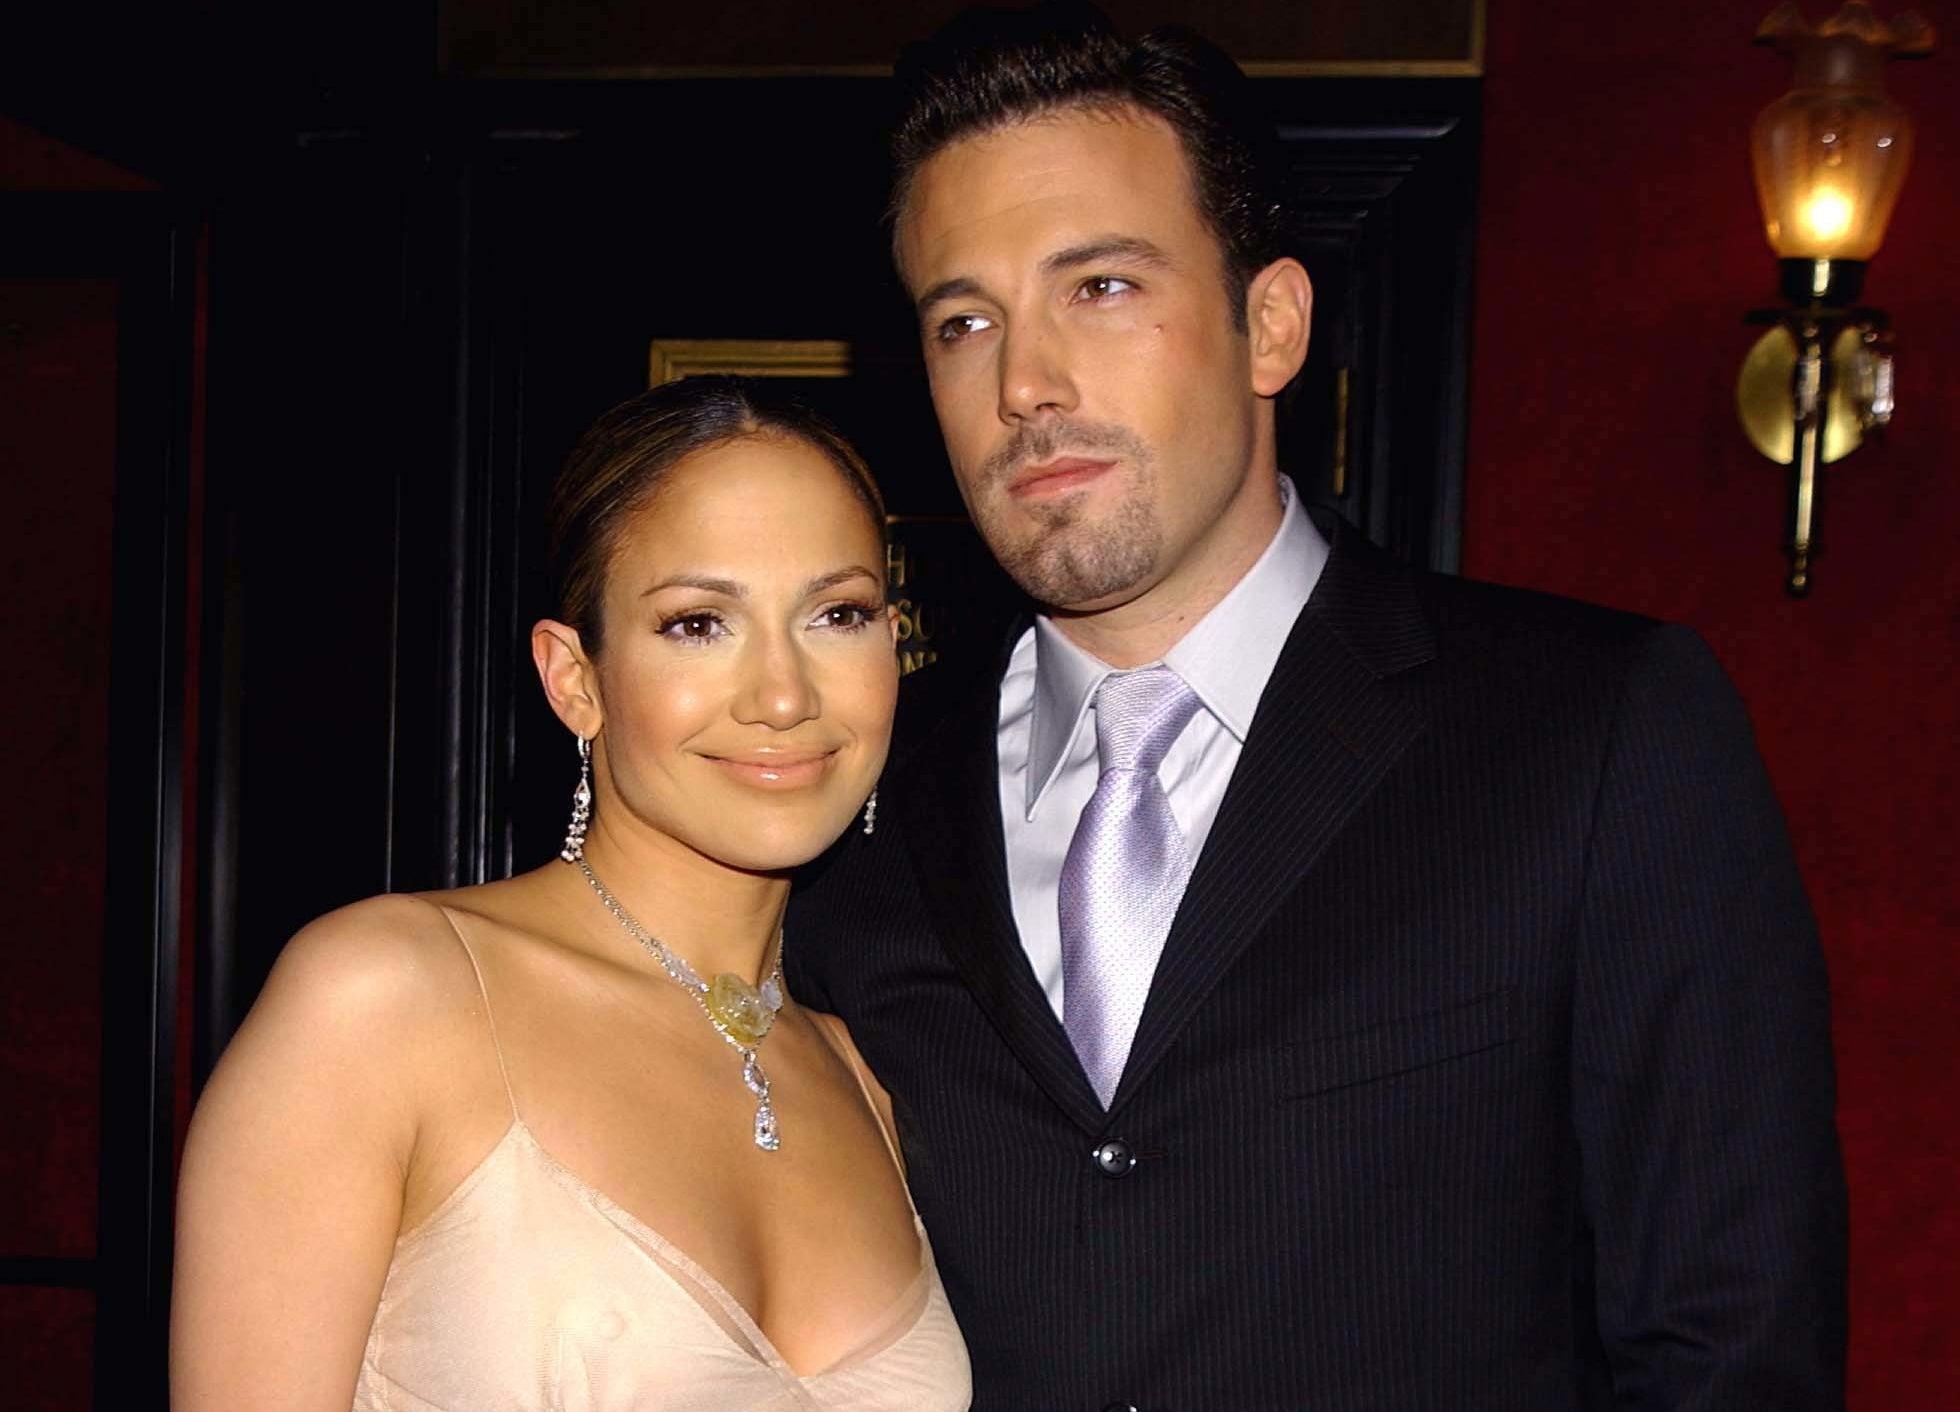 An older photo of Ben and Jennifer posing together